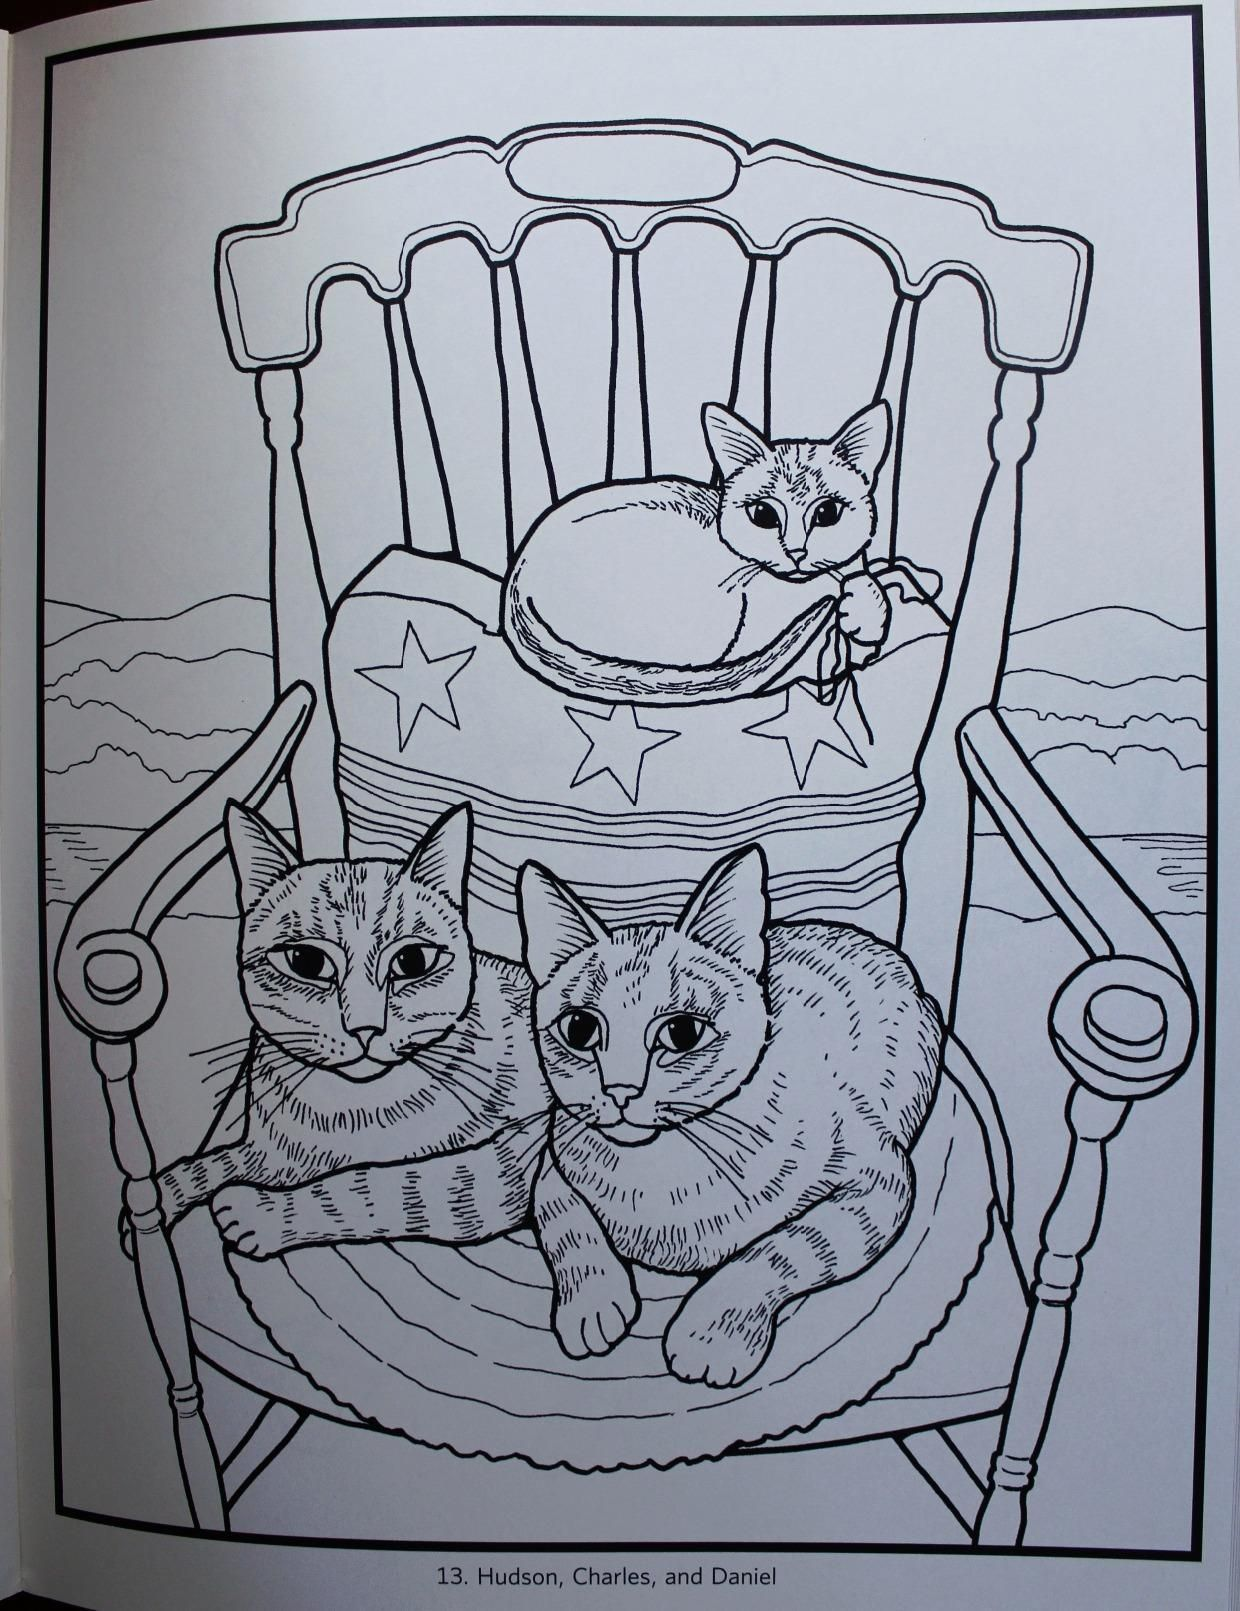 Mimi Vang Olsen Cats Coloring Book Inc Pomegranate Communications 9780764959806 Amazon Com Books Cat Coloring Book Coloring Books Cat Colors